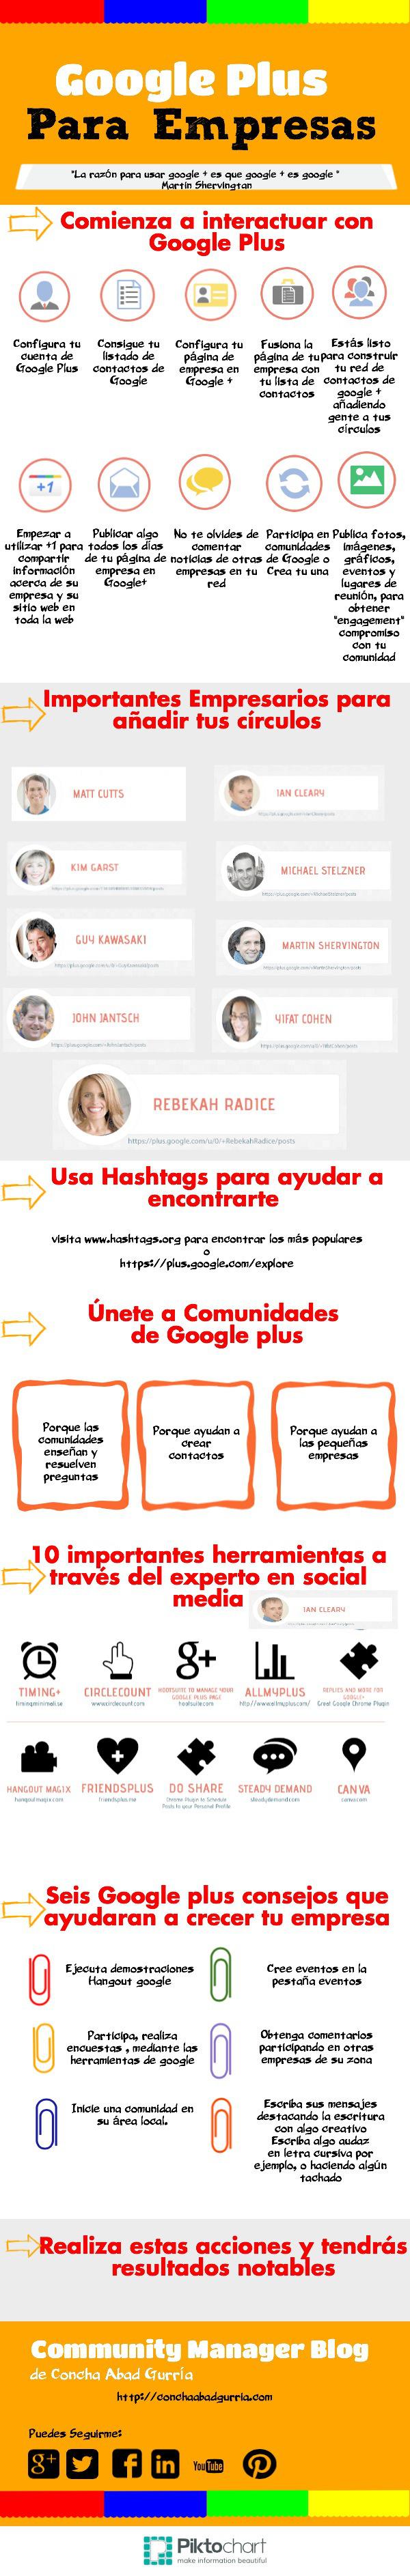 Google + para empresas